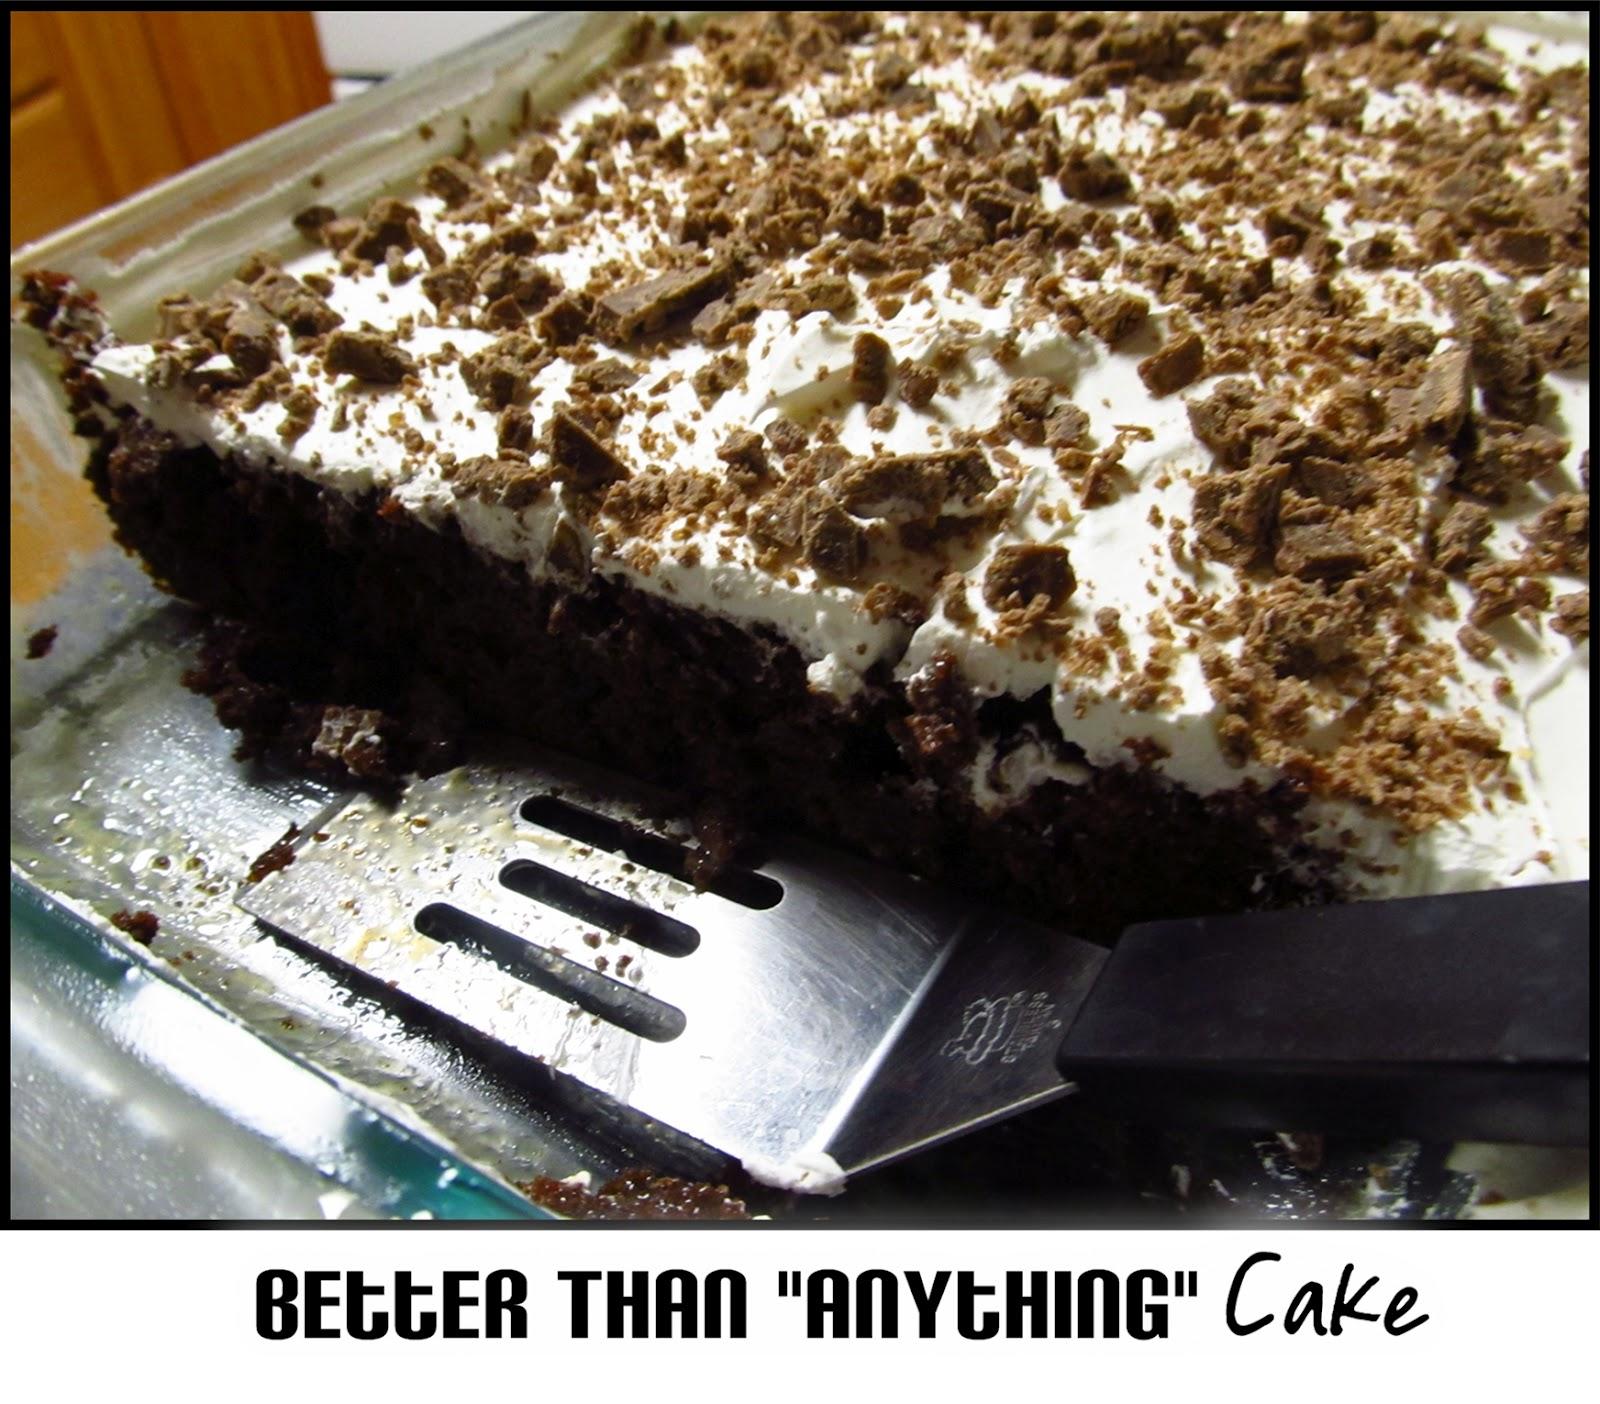 Better than viagra cake